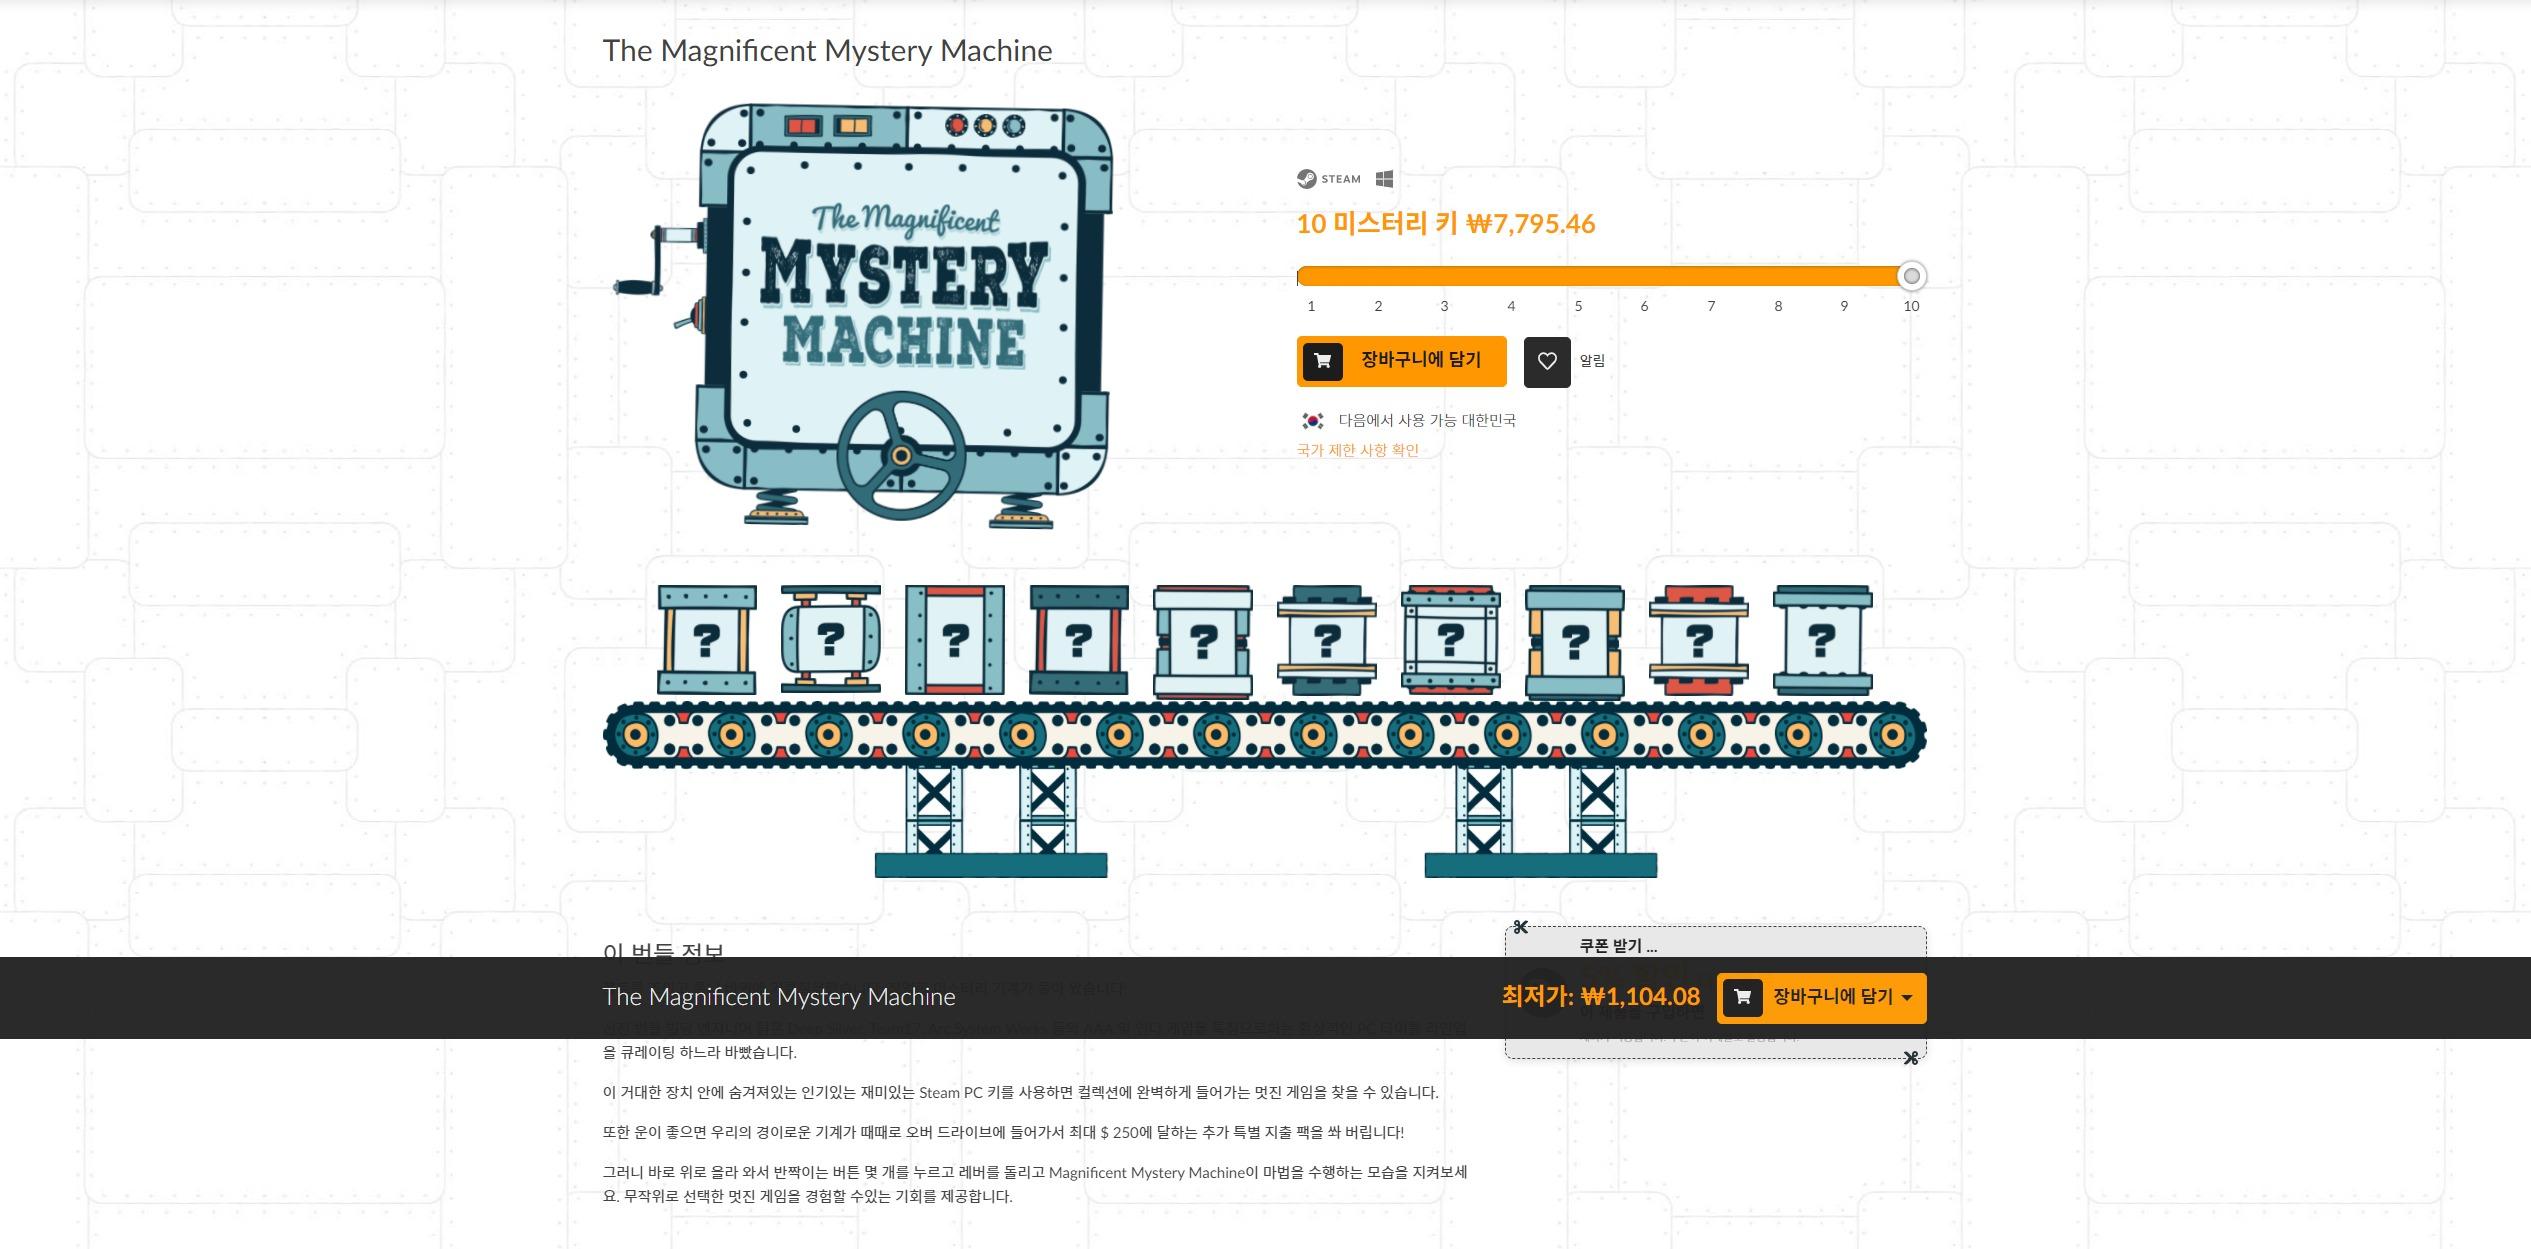 FireShot Capture 726 - The Magnificent Mystery Machine - Steam게임 번들 - Fanatical - www.fanatical.com.jpg